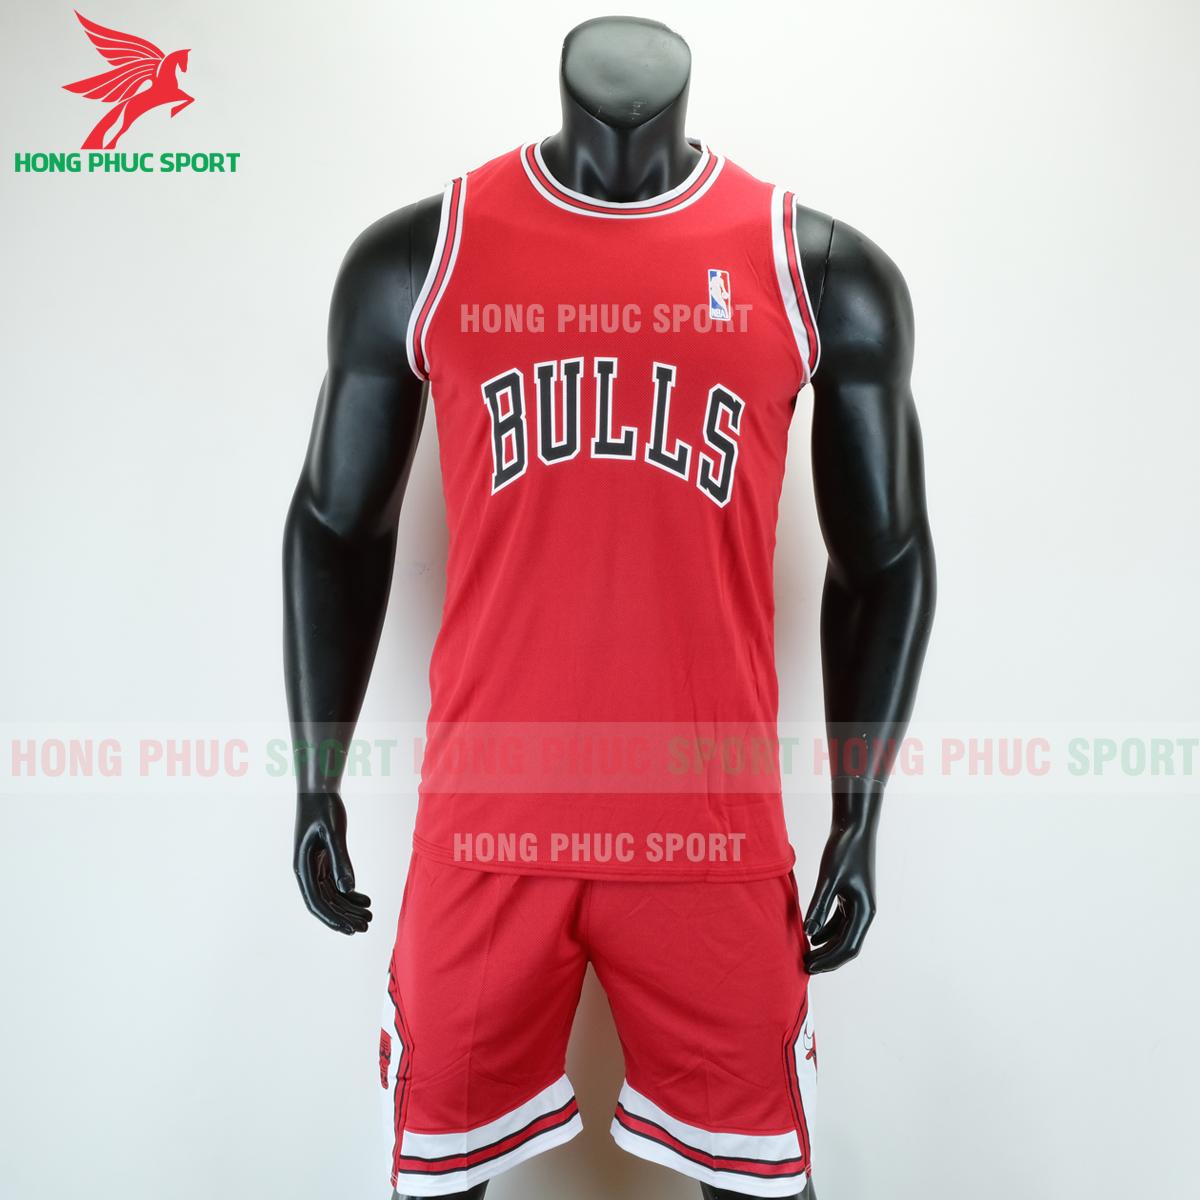 https://cdn.hongphucsport.com/unsafe/s4.shopbay.vn/files/285/ao-bong-ro-bulls-mau-do-6-5f76dc00ae45c.png